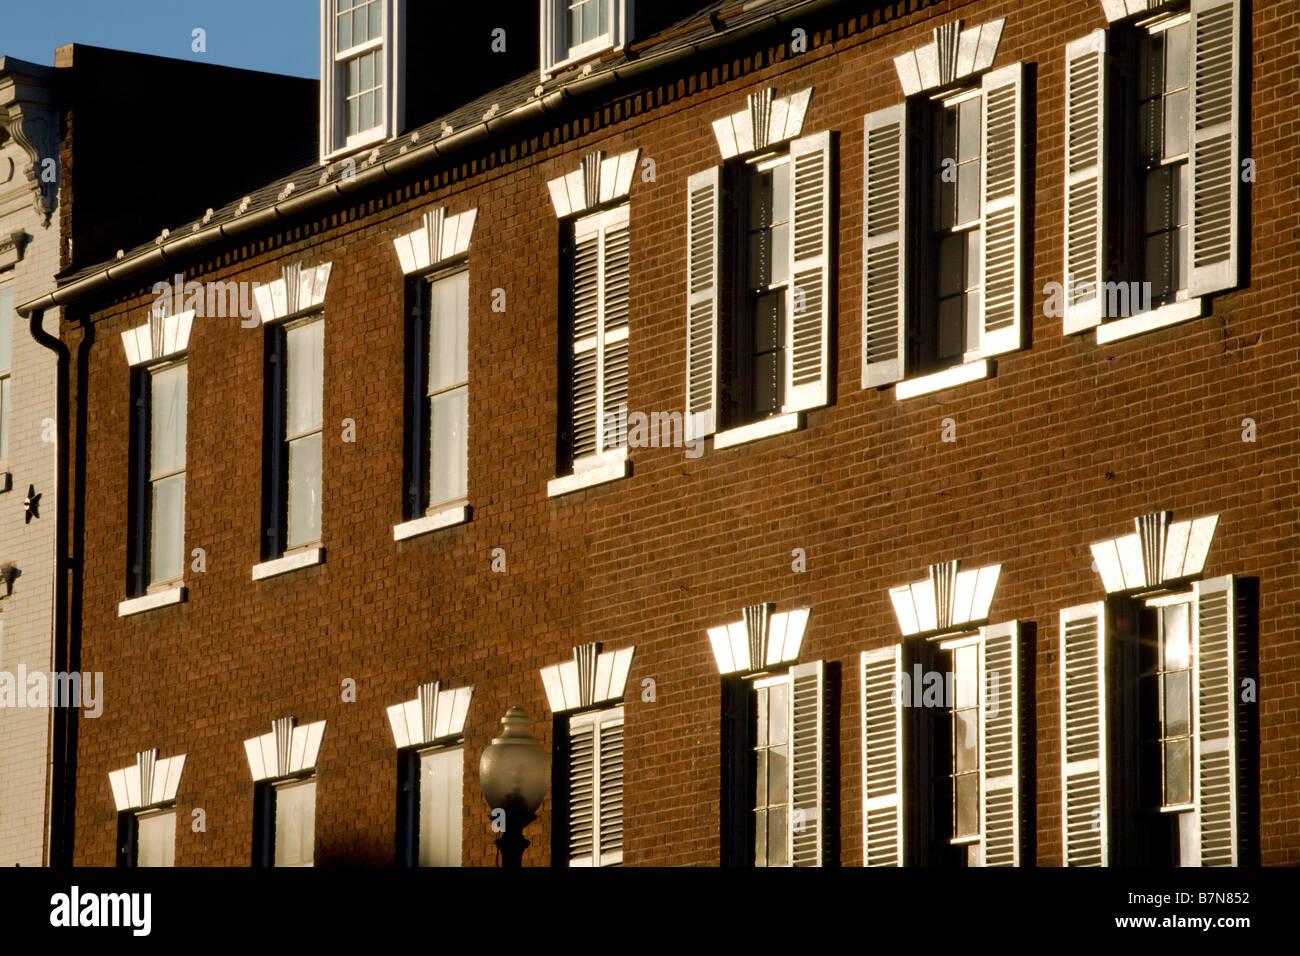 Architecture La rue M Georgetown Washington D.C. Photo Stock